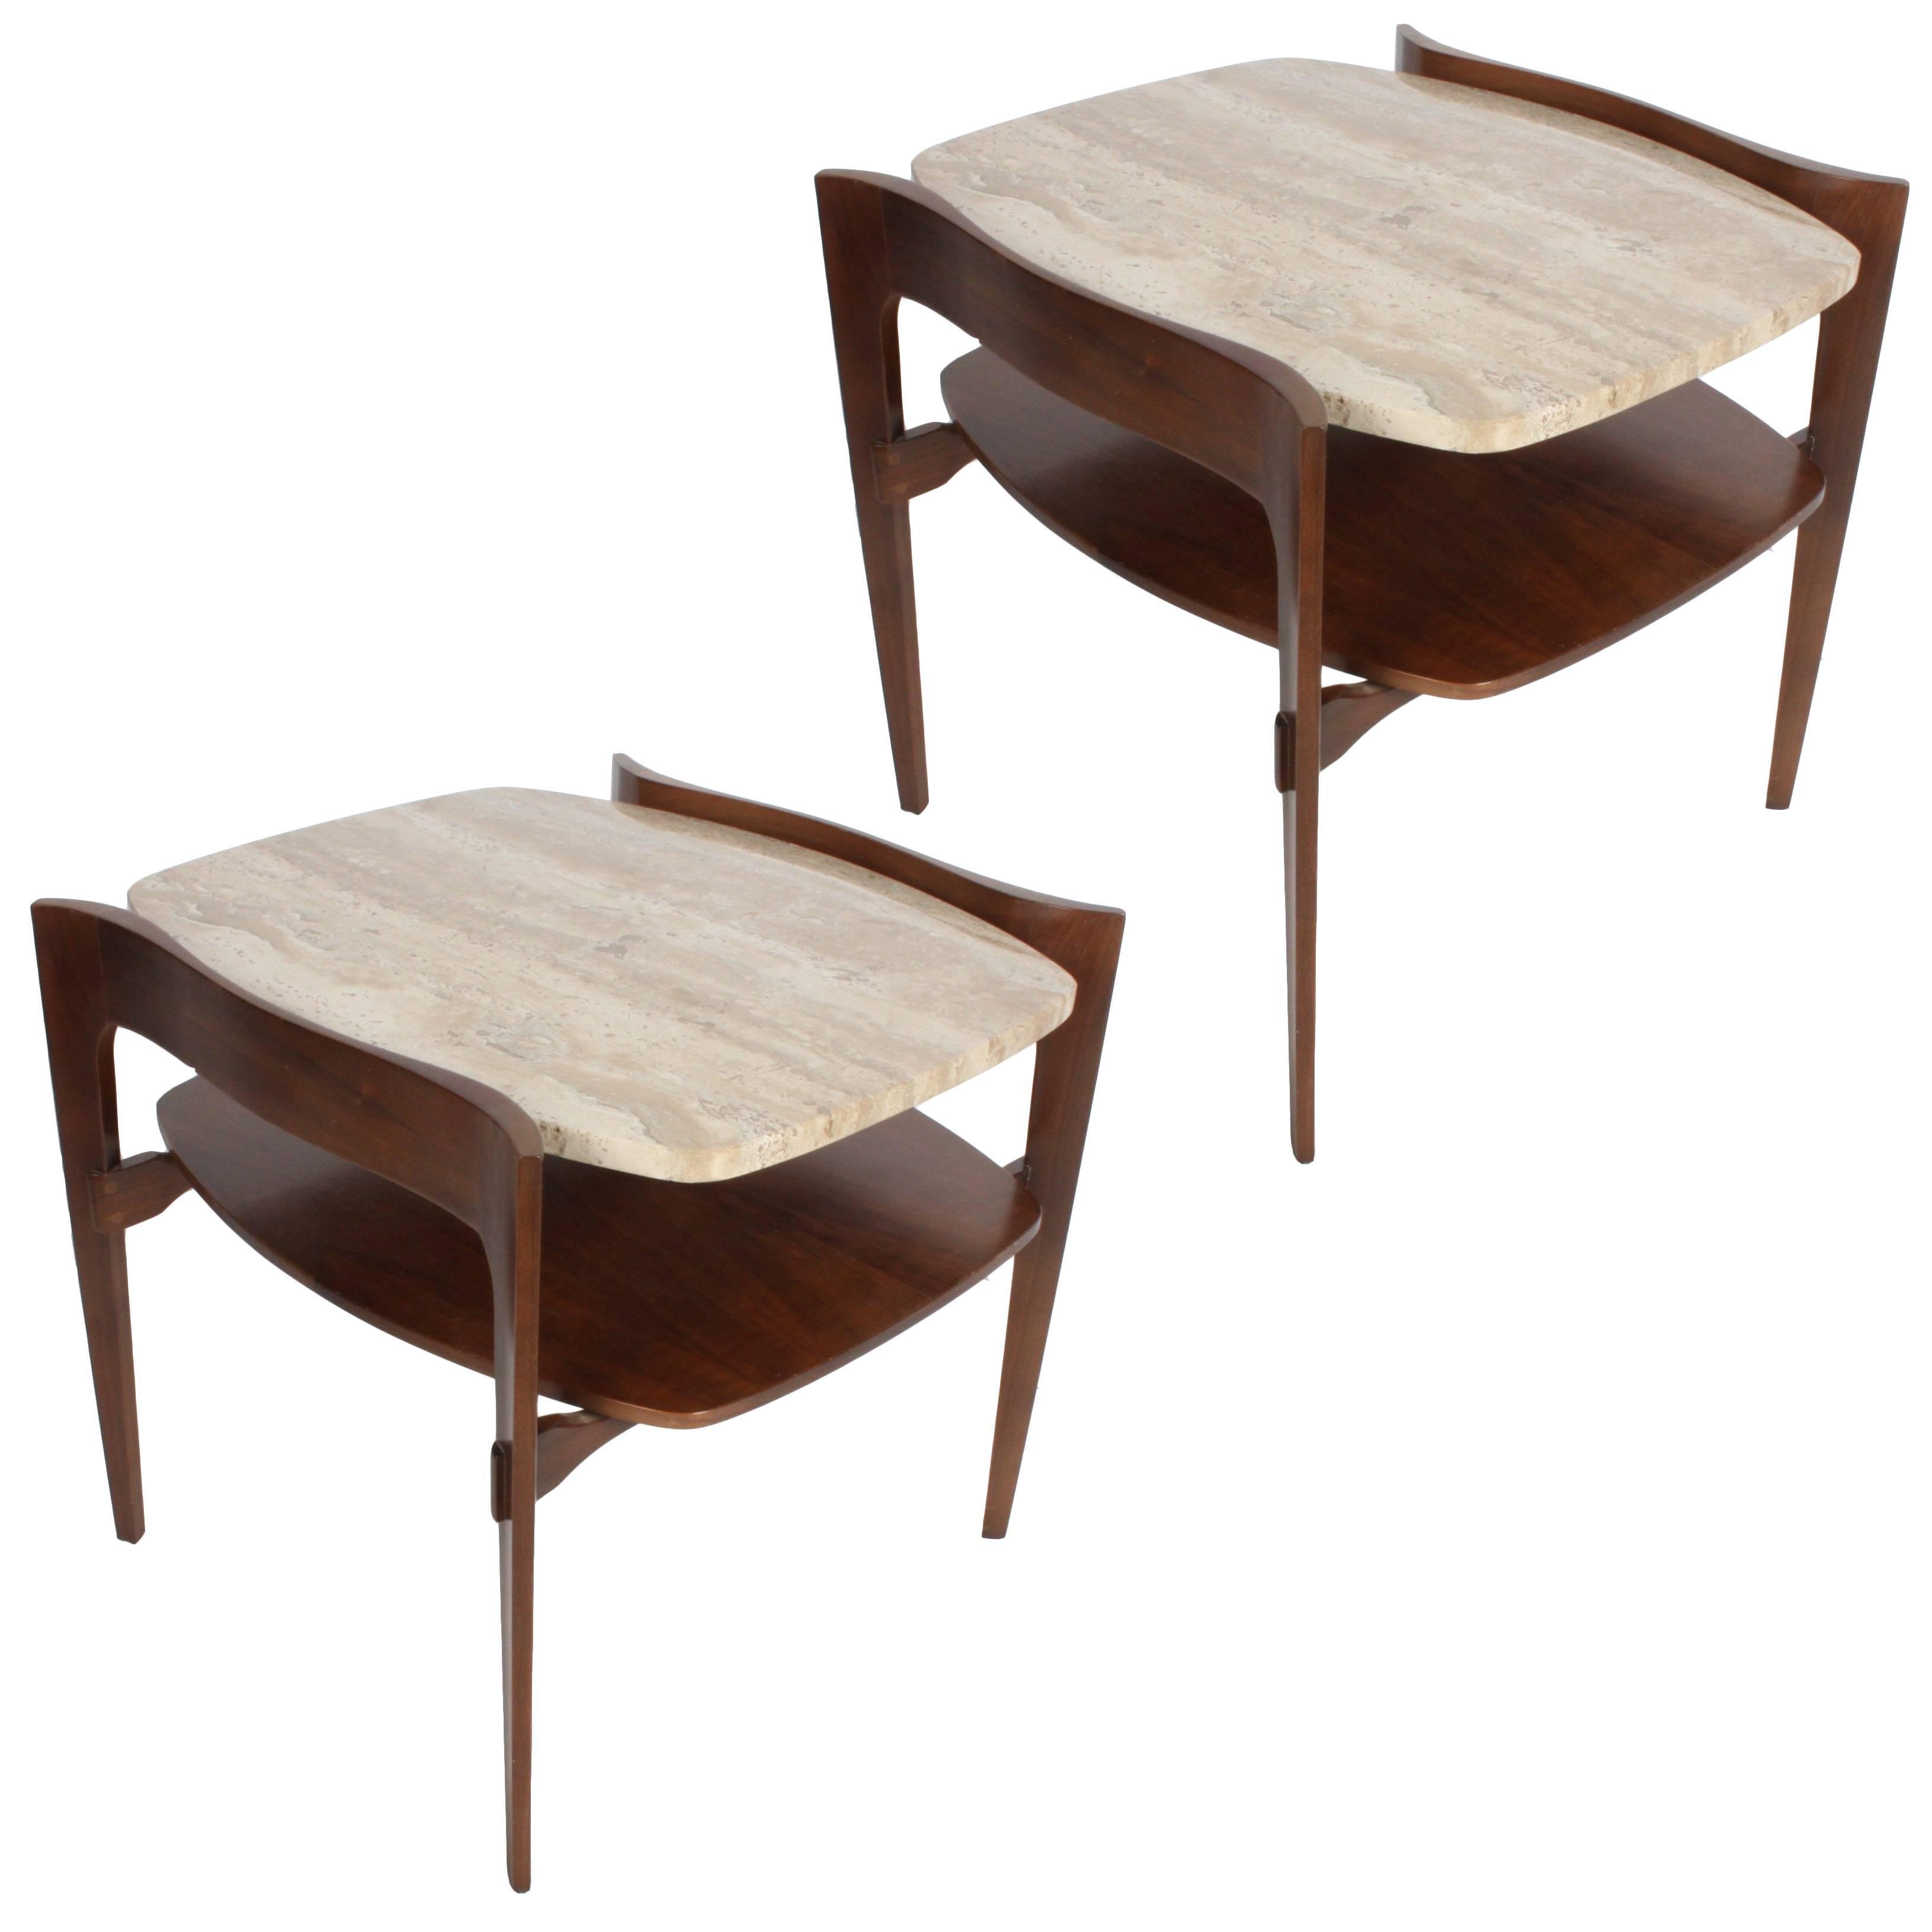 Pair of Bertha Schaefer Italian End Tables